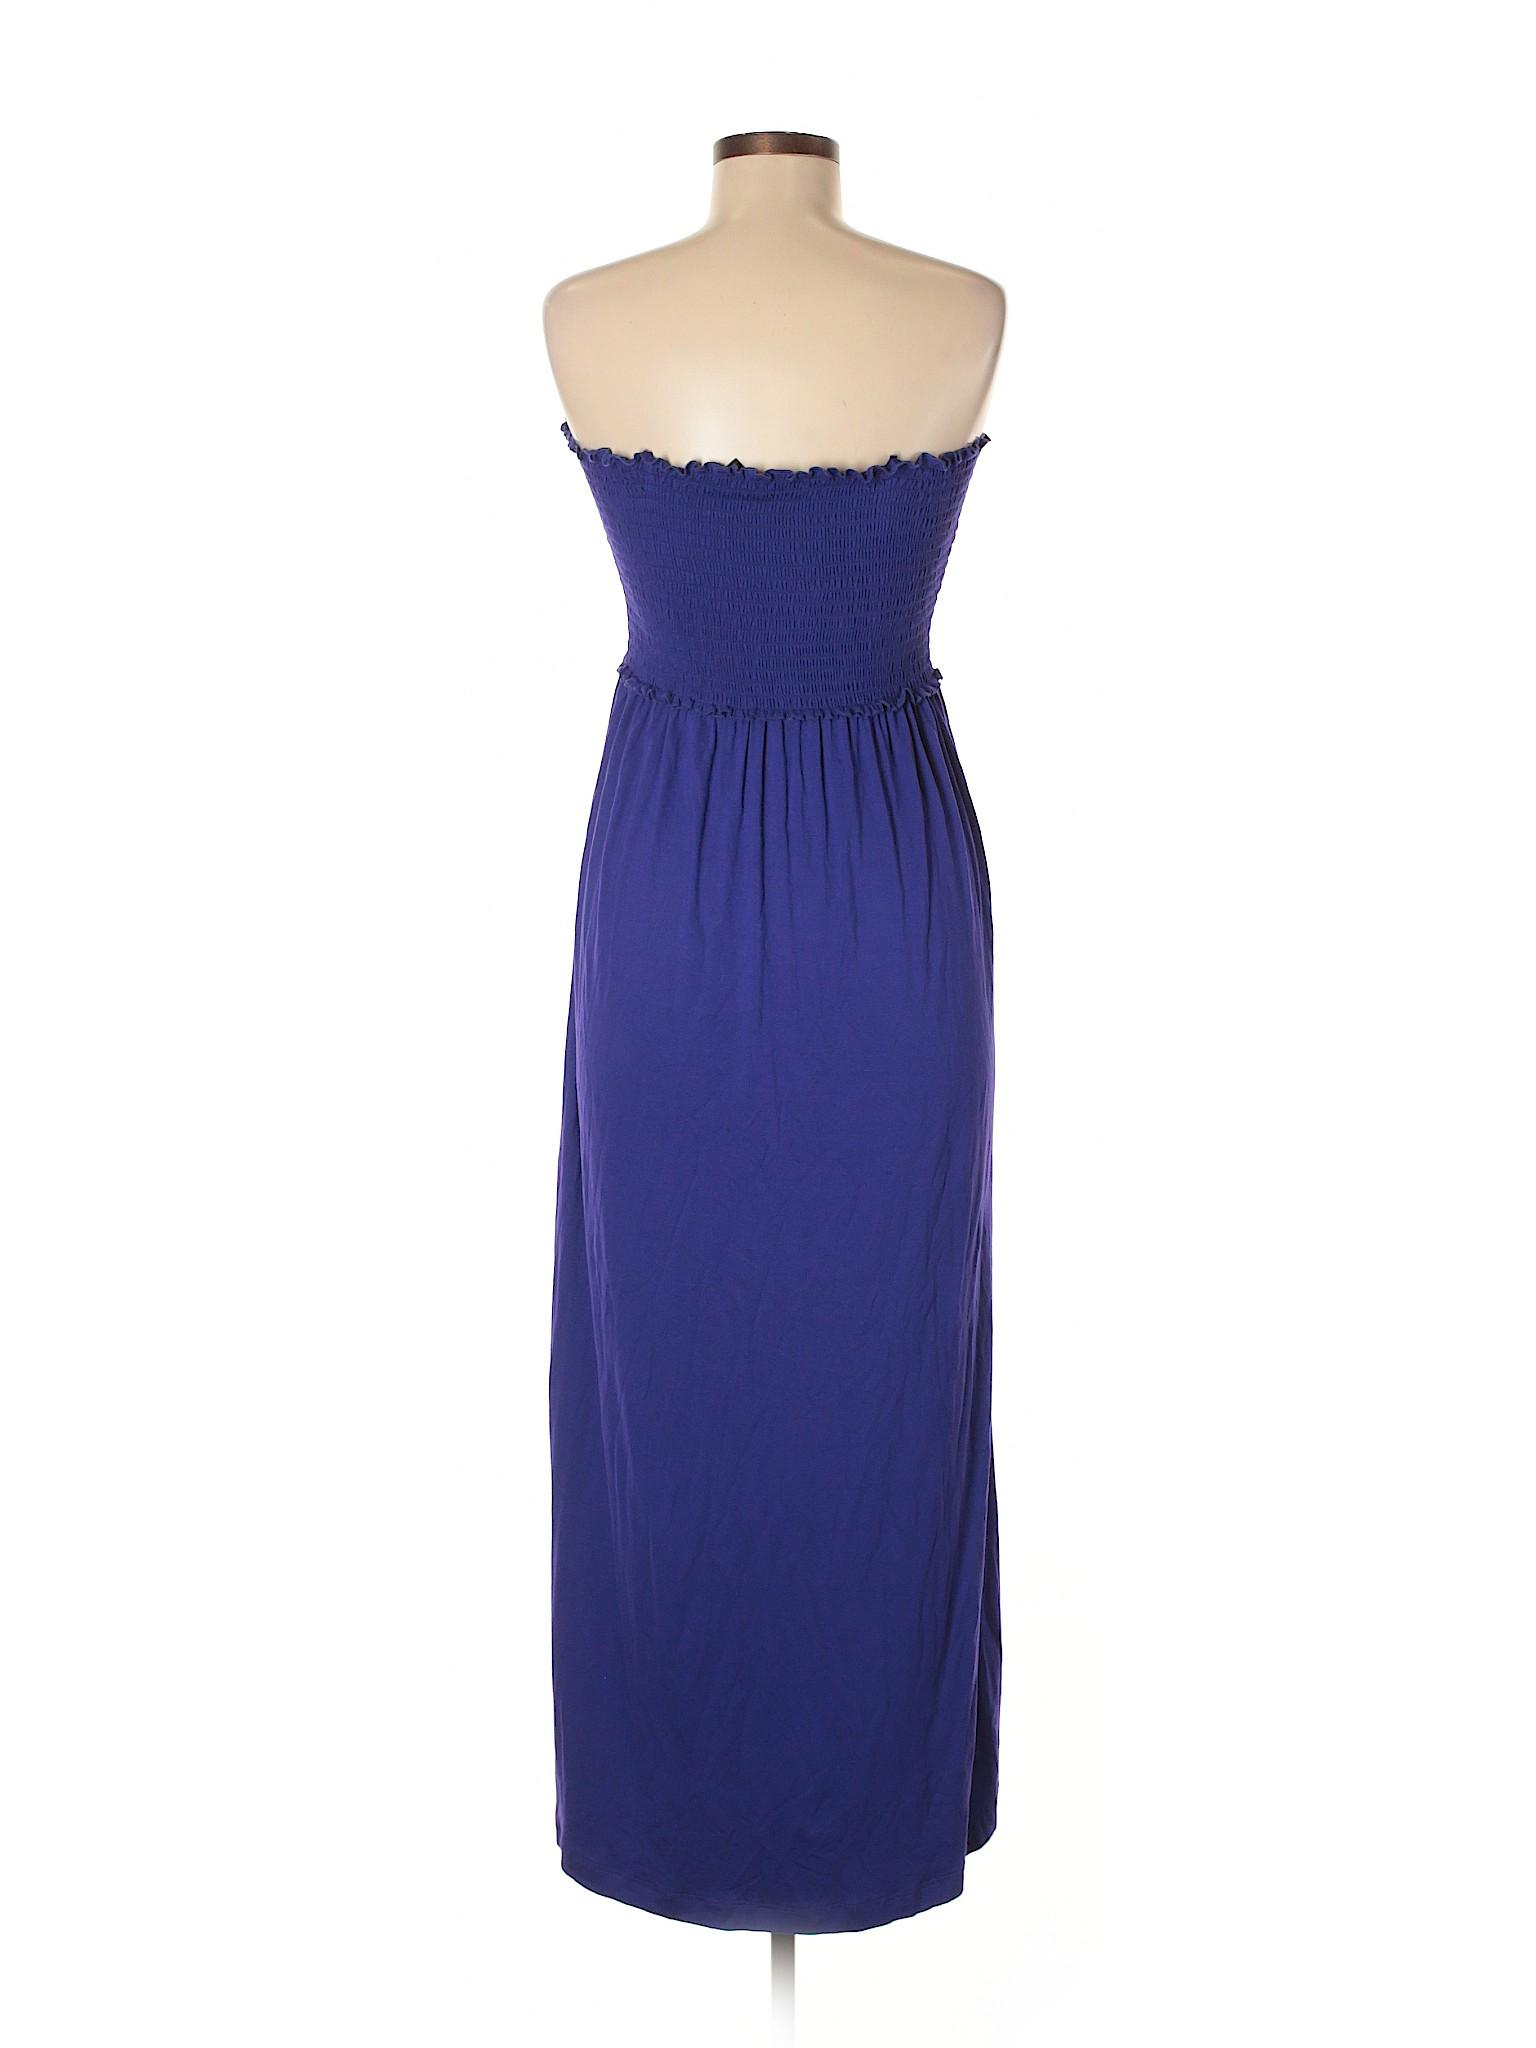 Selling Selling Casual BCBGMAXAZRIA BCBGMAXAZRIA Dress Dress Dress Selling Selling Casual BCBGMAXAZRIA Selling Casual BCBGMAXAZRIA Casual Dress q4n1g